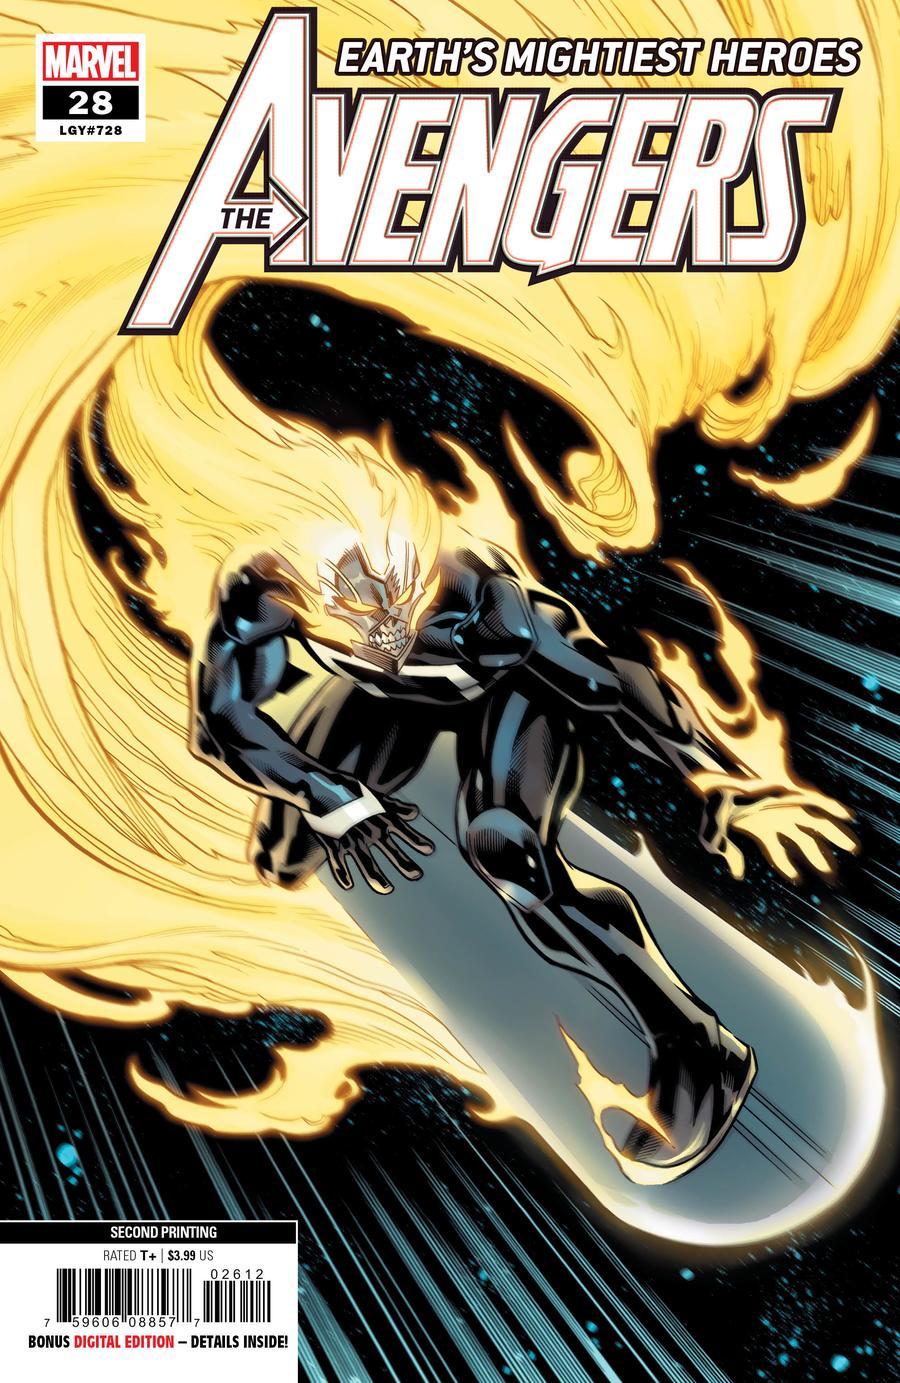 Avengers Vol 7 #28 Cover C 2nd Ptg Ed McGuinness Variant Cover